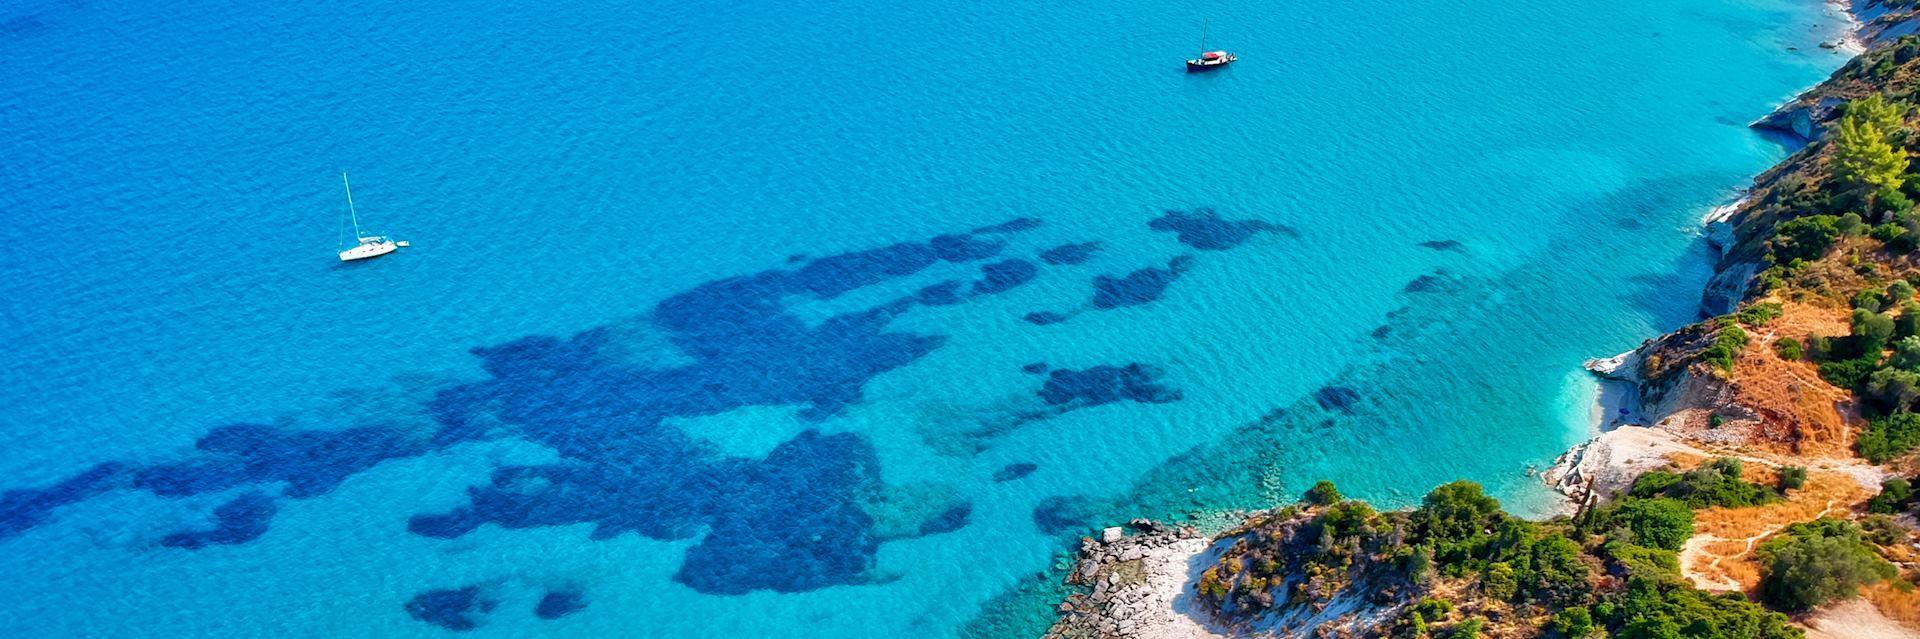 Aerial view of Bahamas coastline